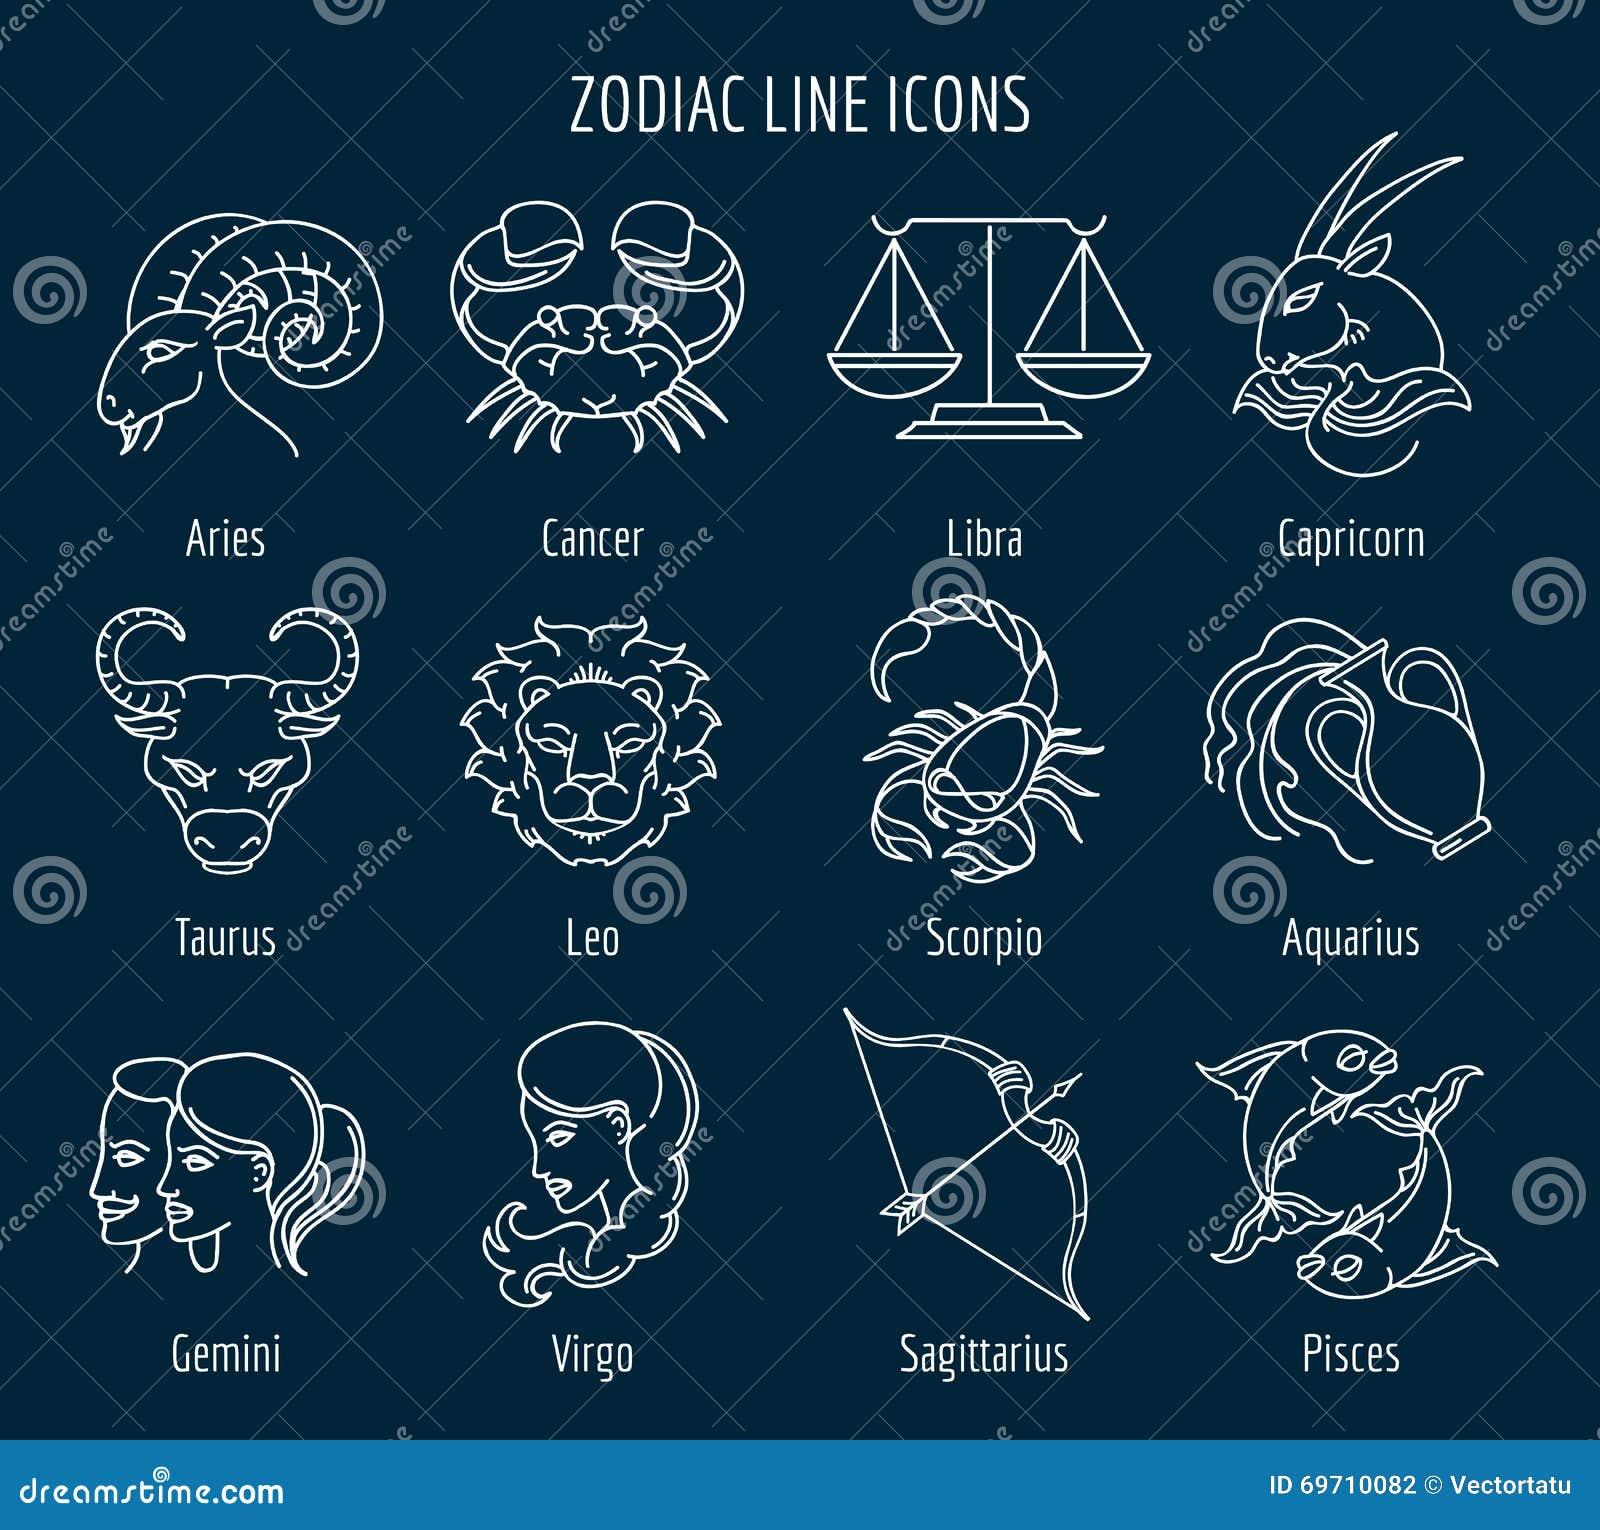 zodiac line icons stock vector image of libra centaur